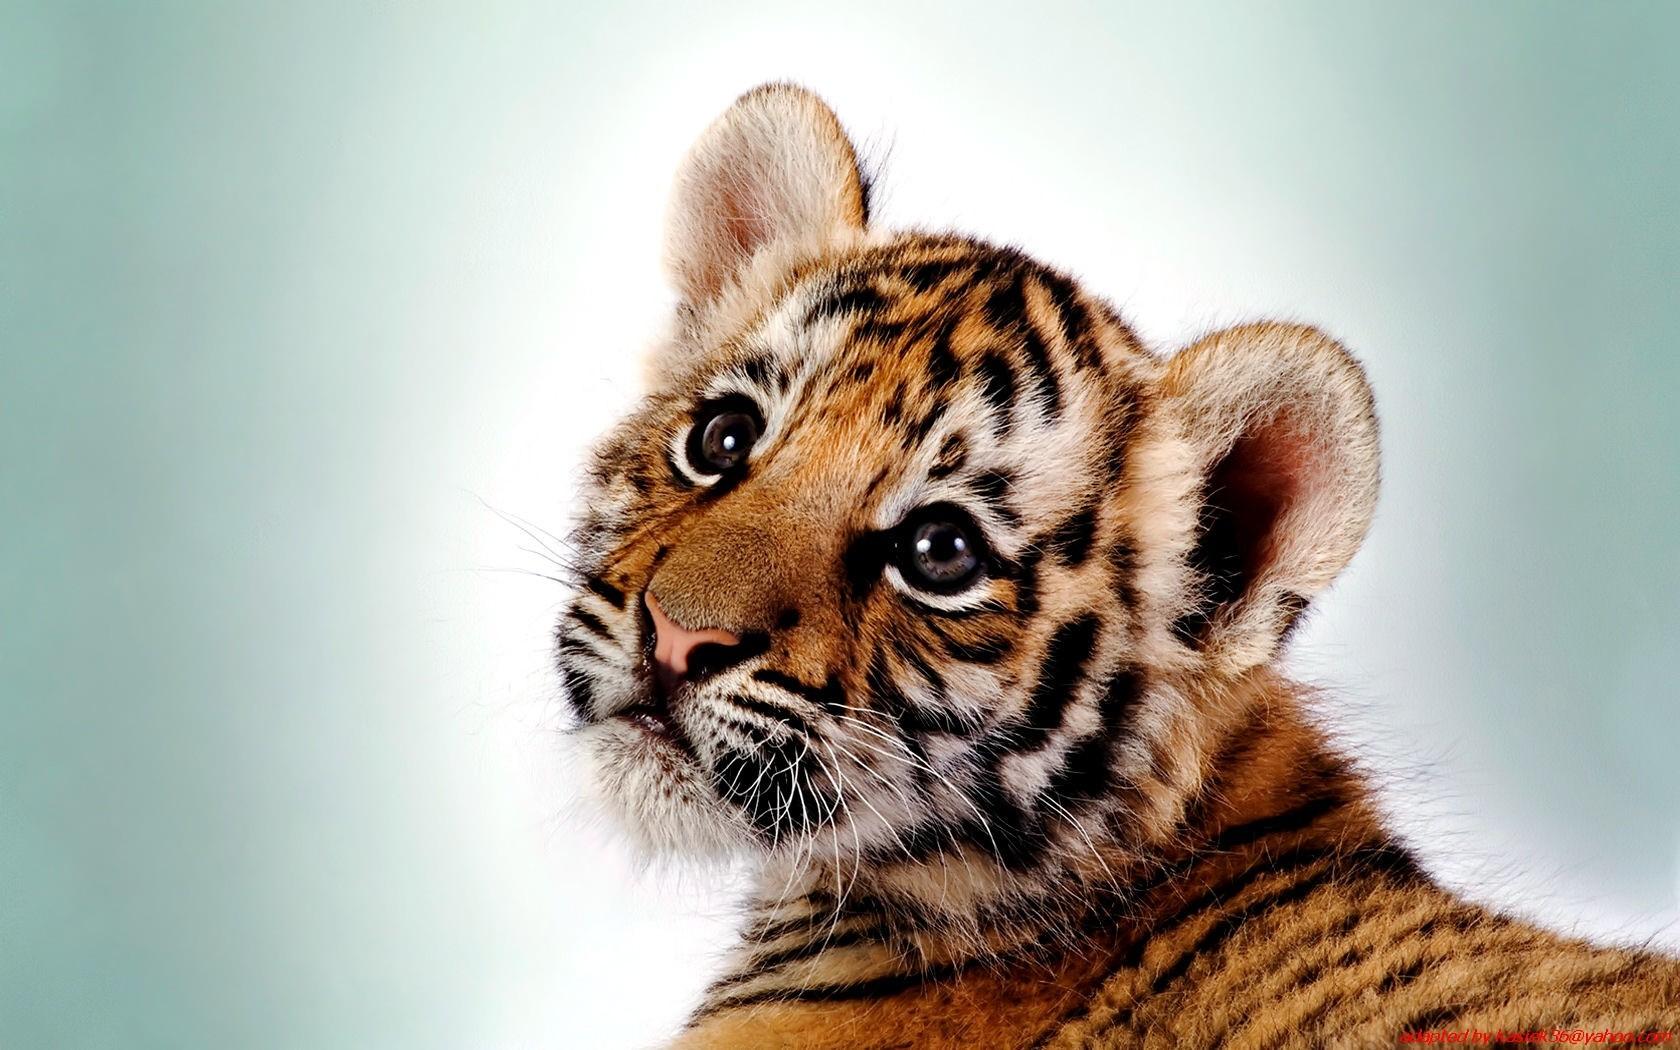 tiger wallpaper dowload